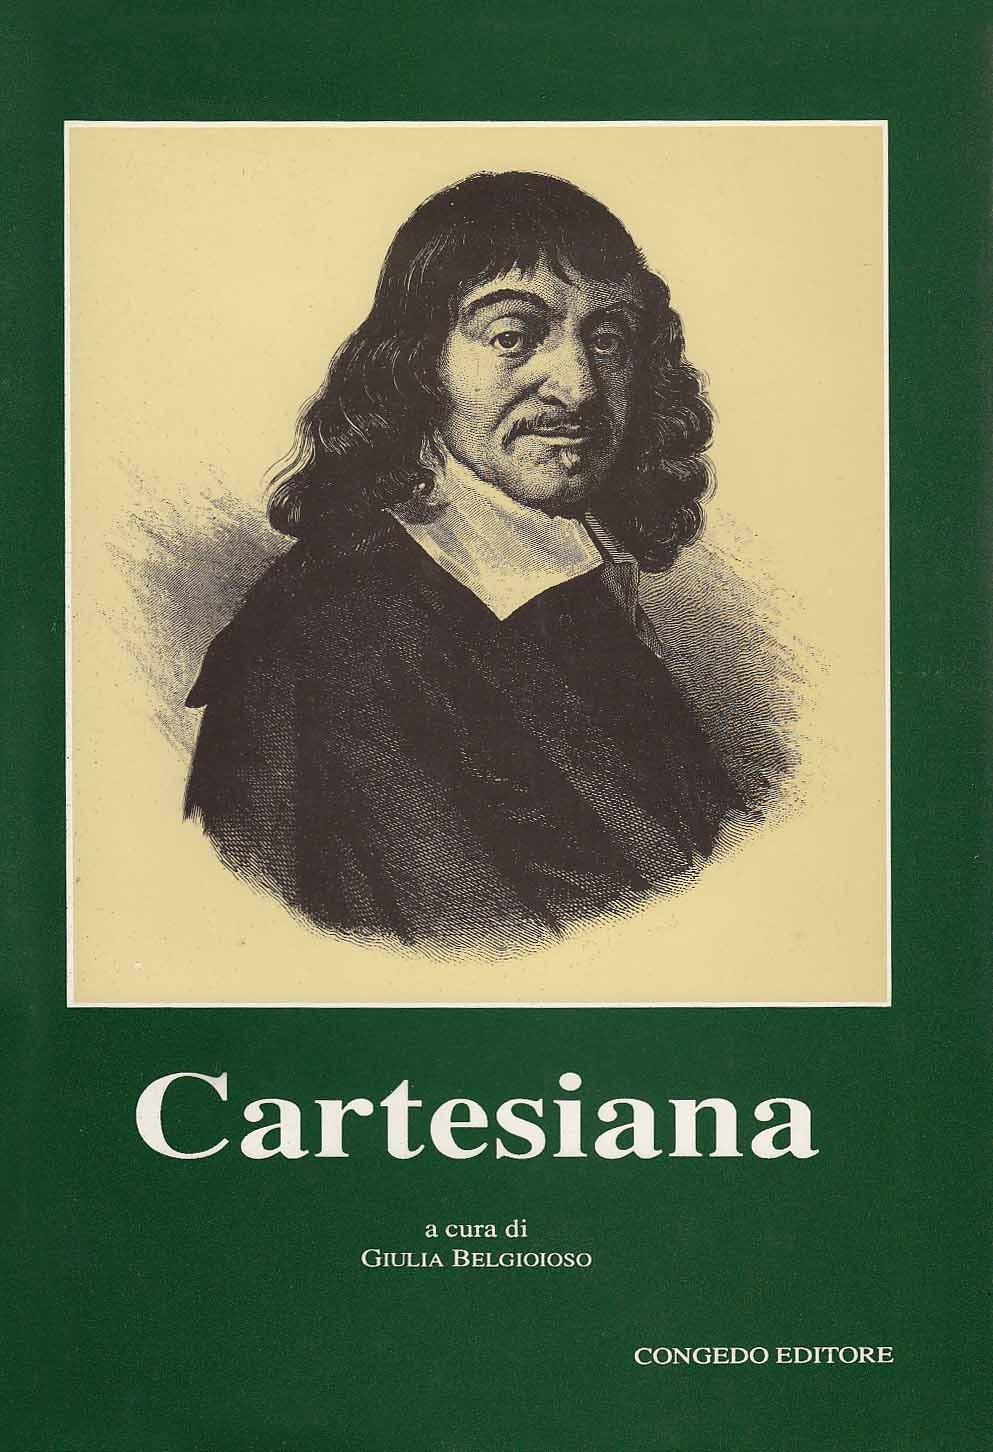 Cartesiana